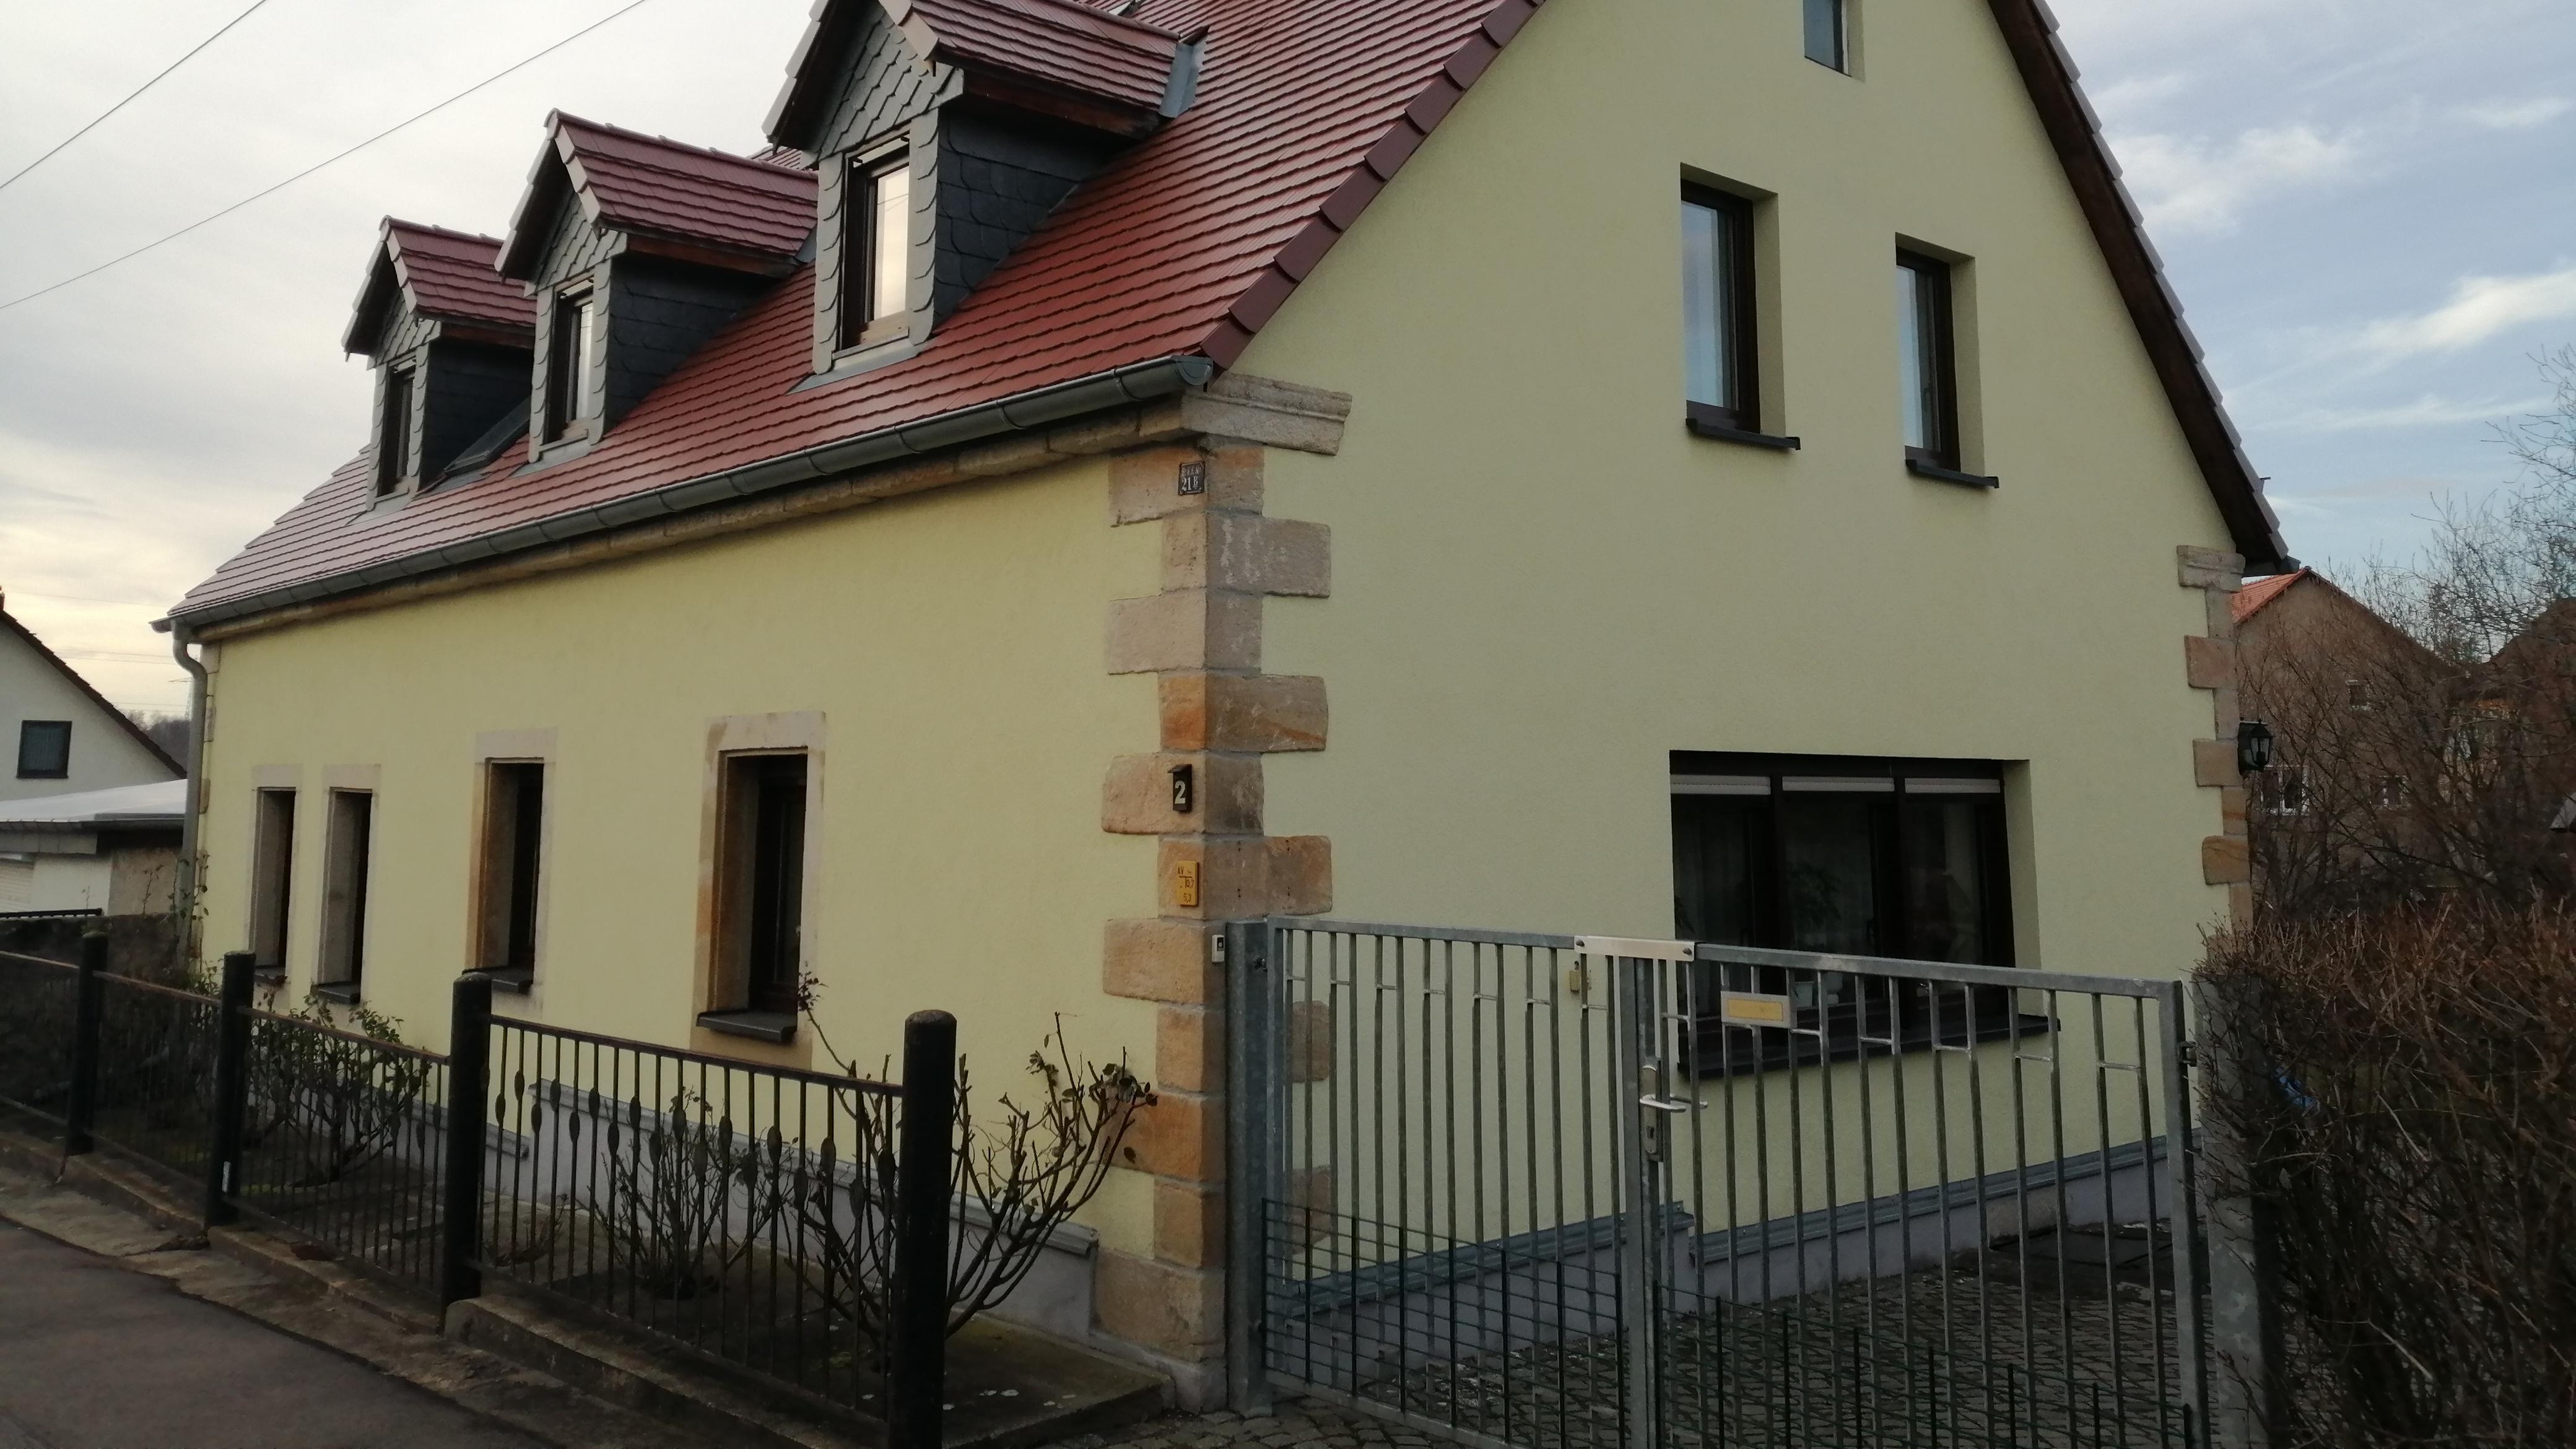 Pension Schröder, Coschützer Hang in Dresden